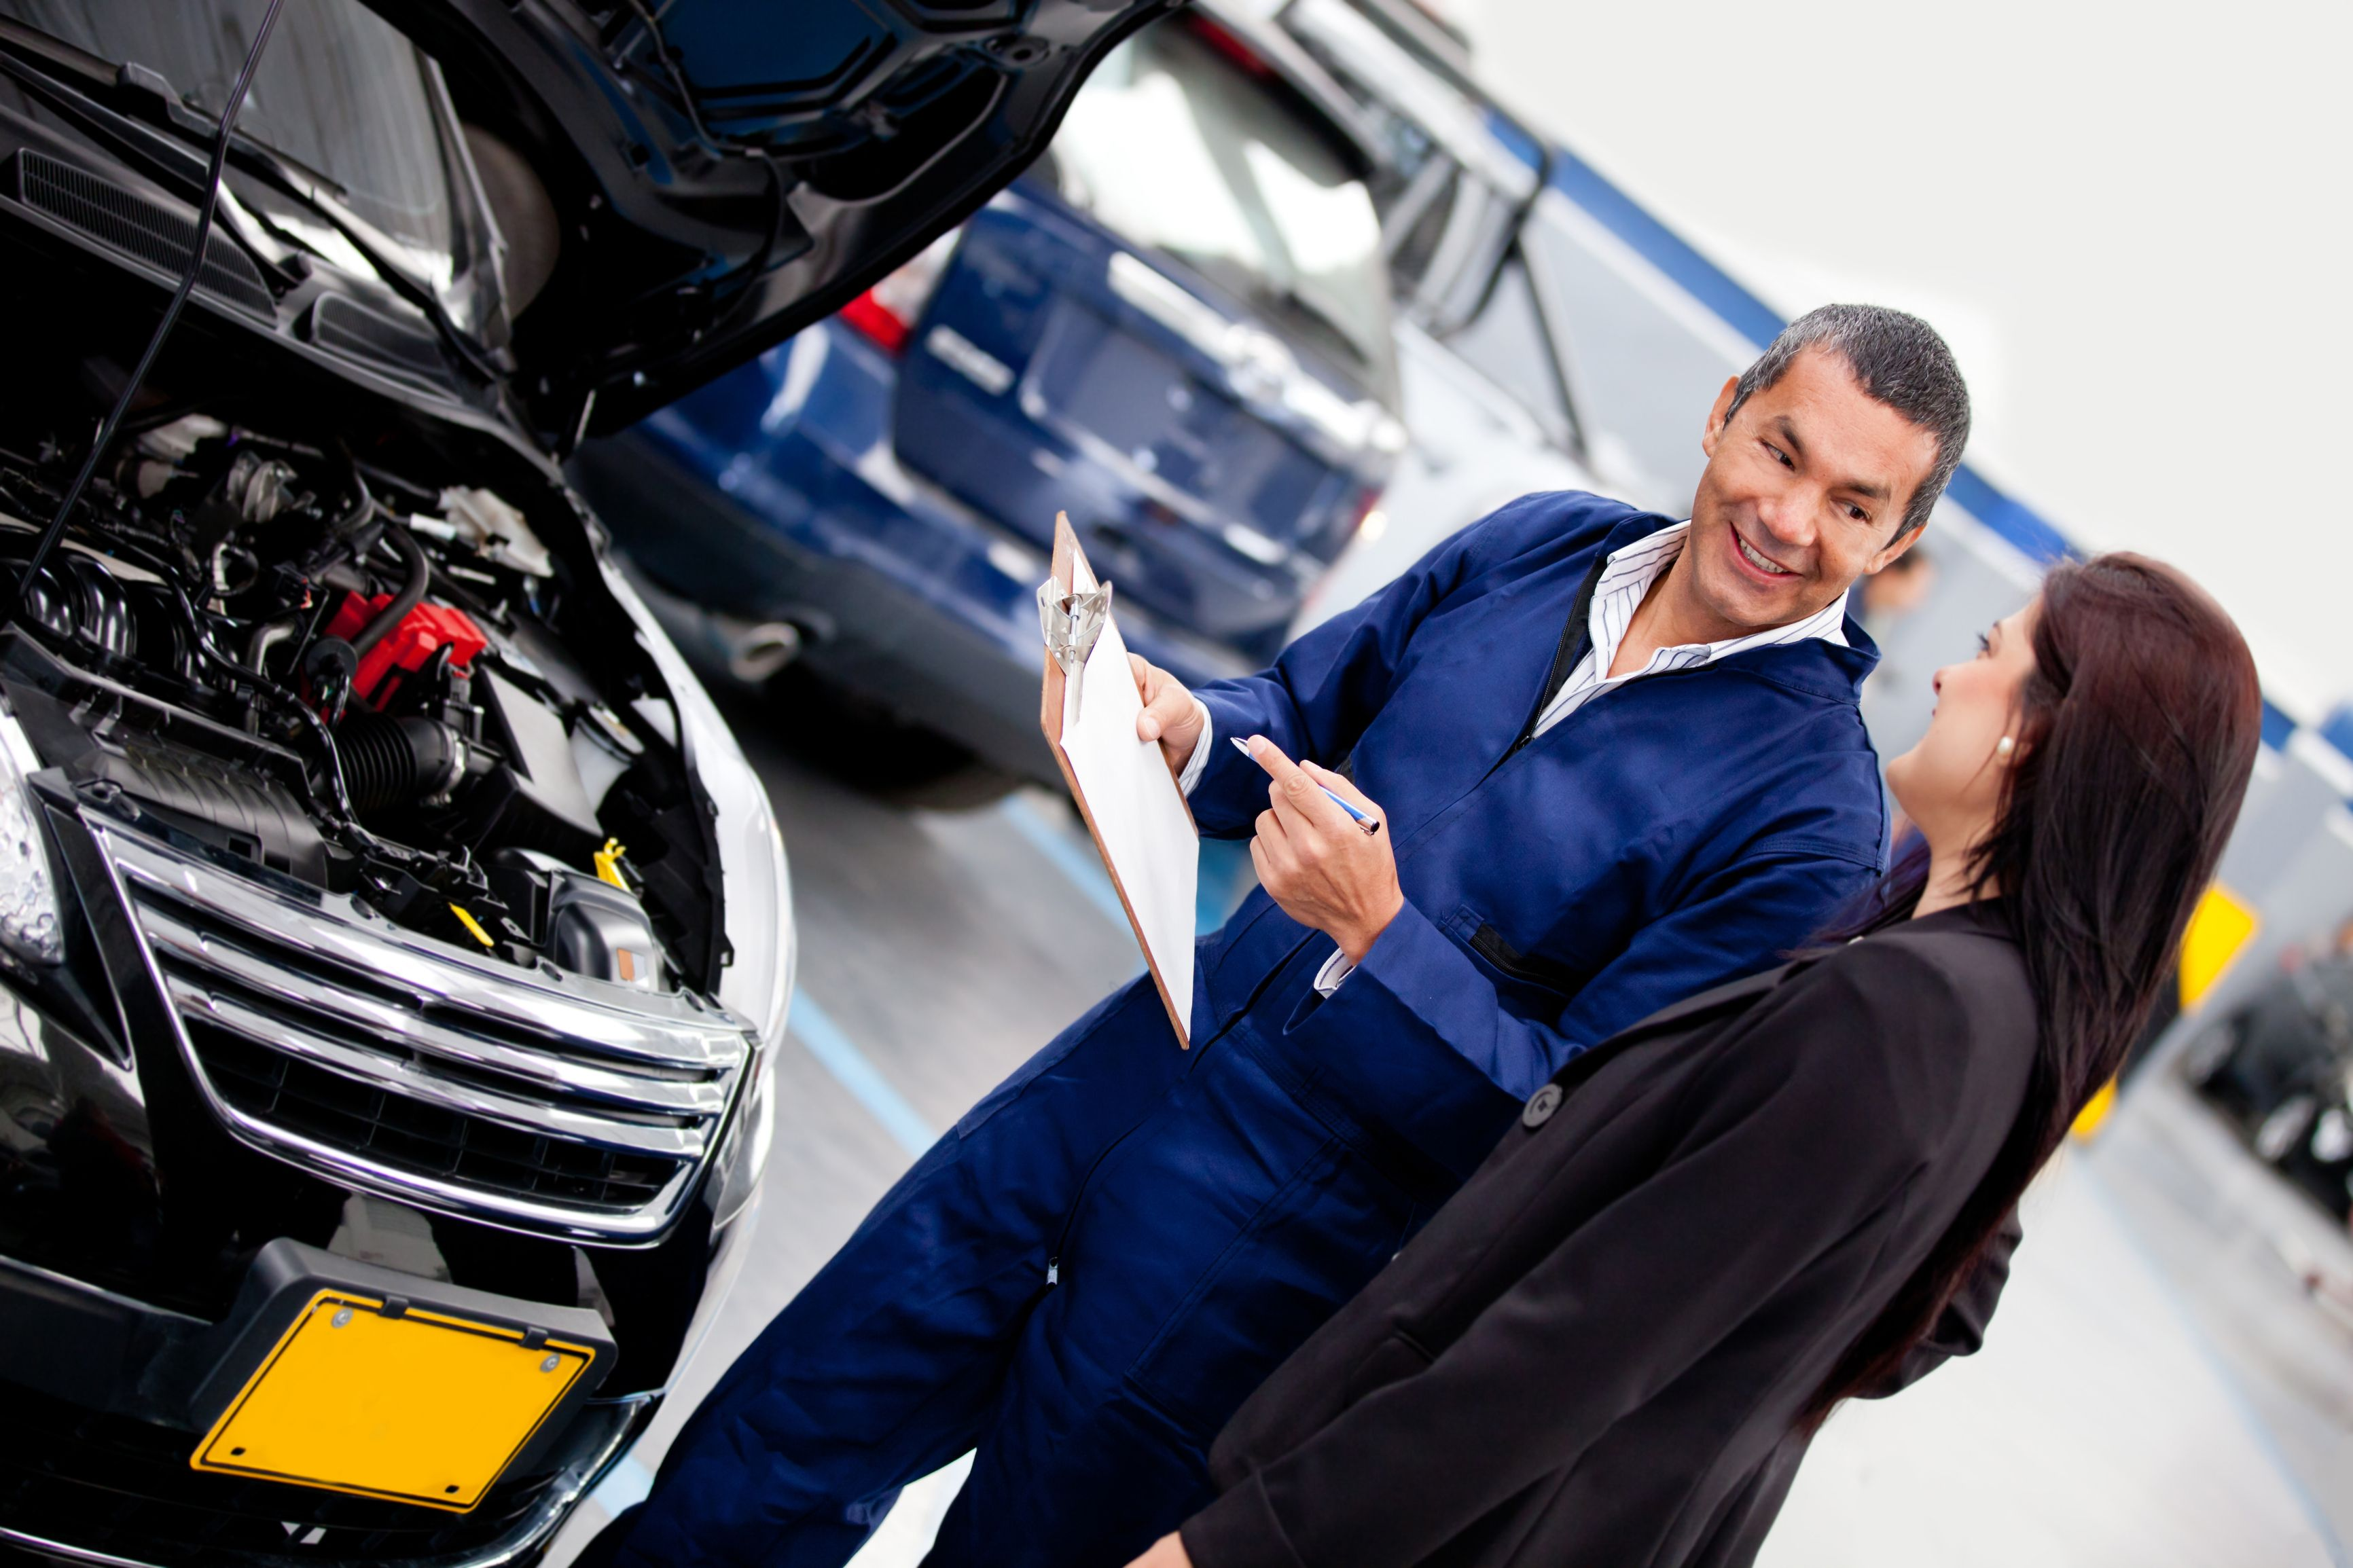 Find Comprehensive Auto Service For Your Range Rover At Land Rover Hoffman Estates Verkstad Hall